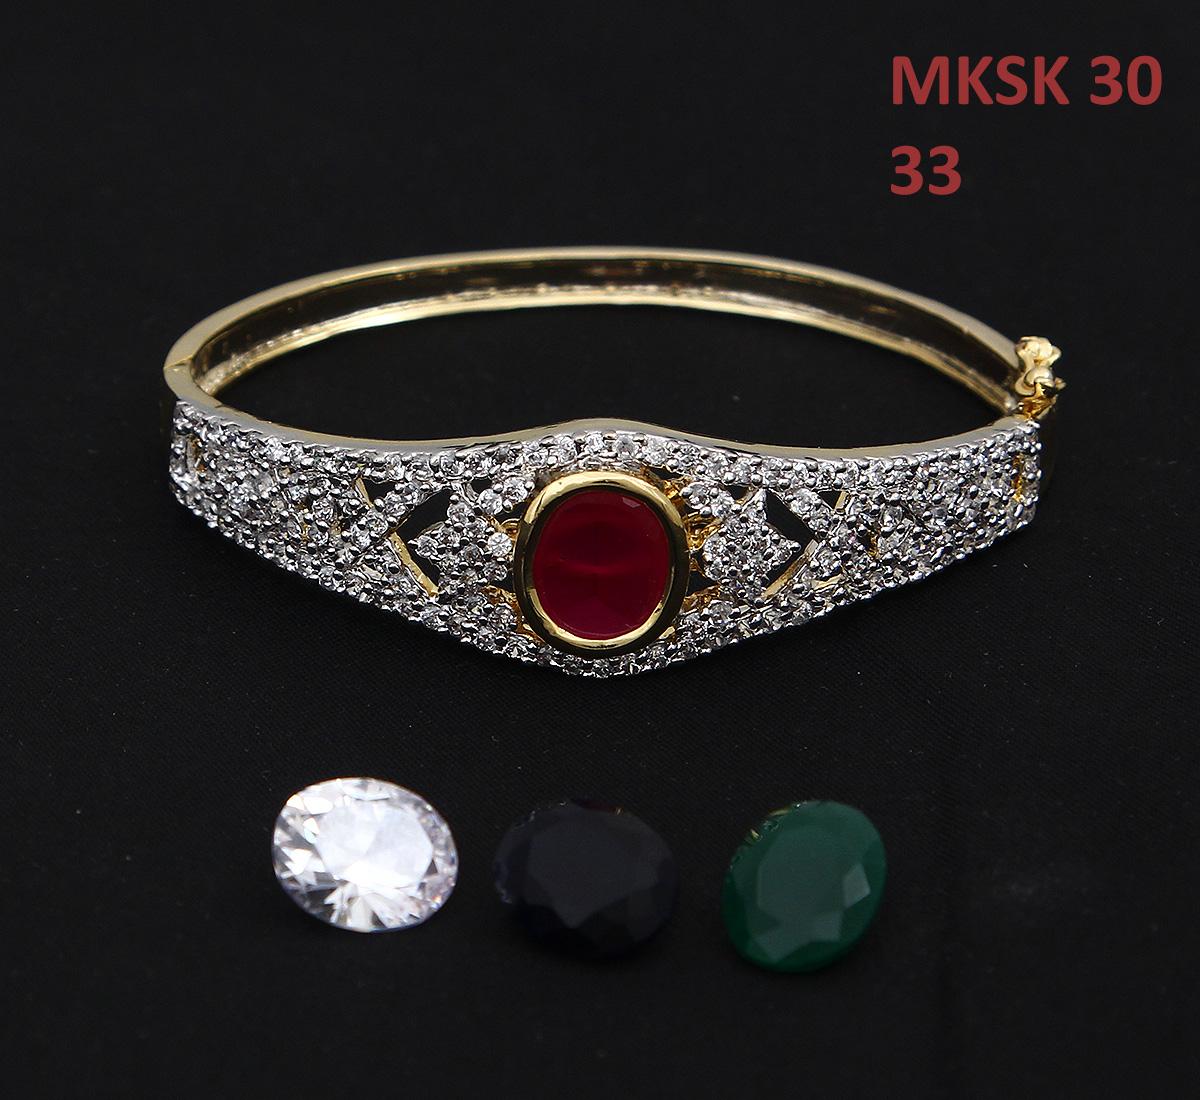 55Carat | 55Carat Beautiful Attractive Bangle Bracelet Red Onyx Hakik Diamond CZ 14K Gold Plated Hand Jewellery Kada Stylish New Fashion Twist & Shine Traditional s for Women Girls